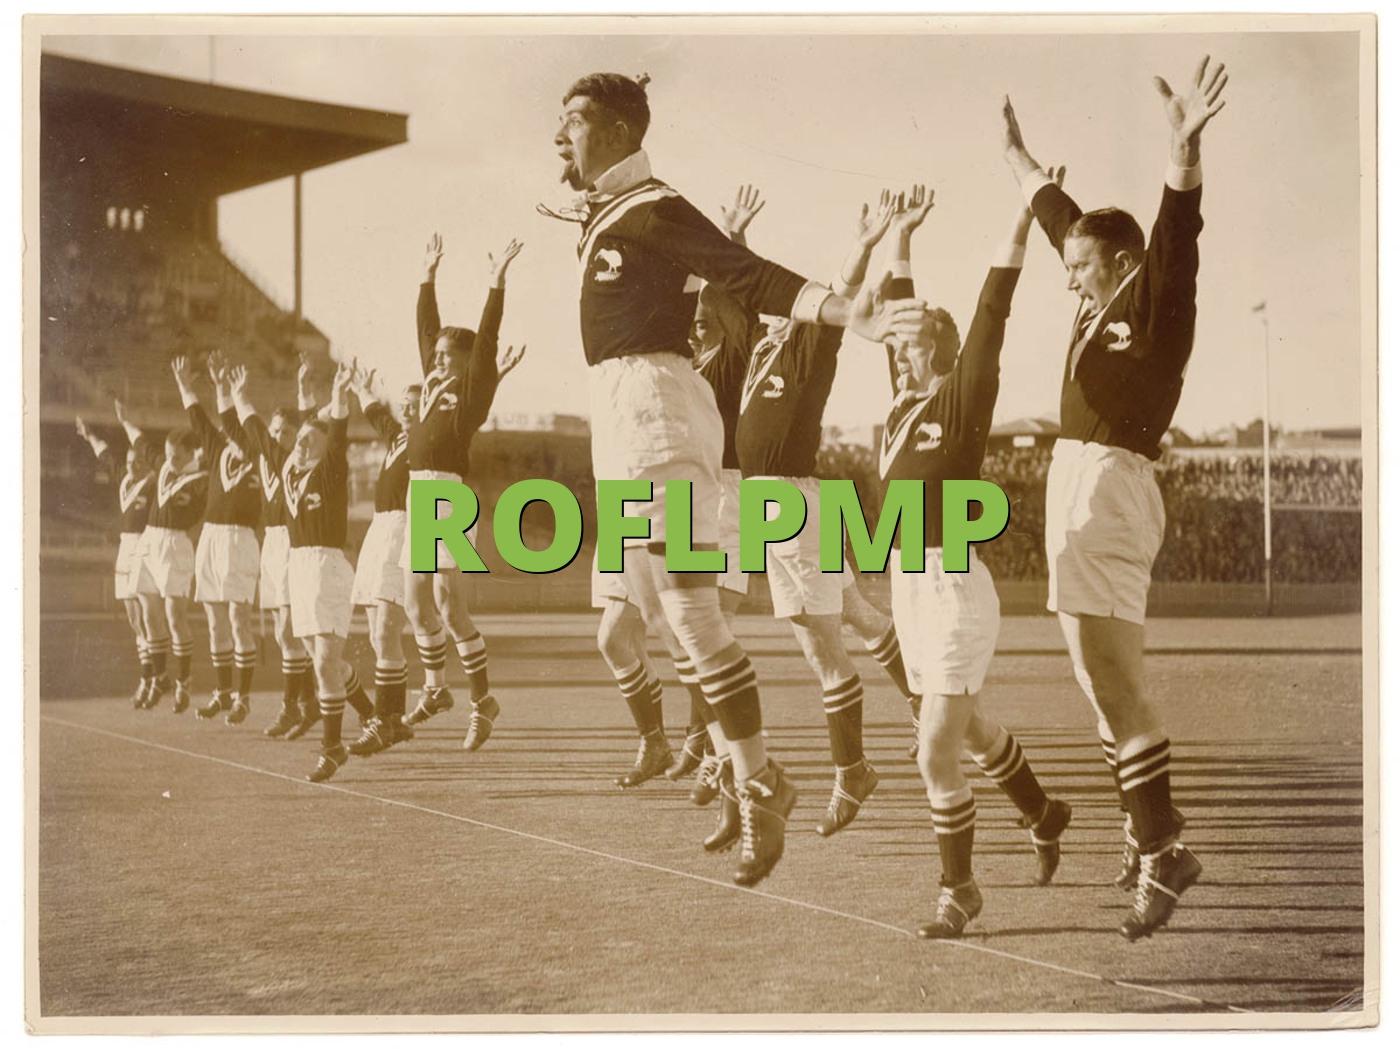 ROFLPMP